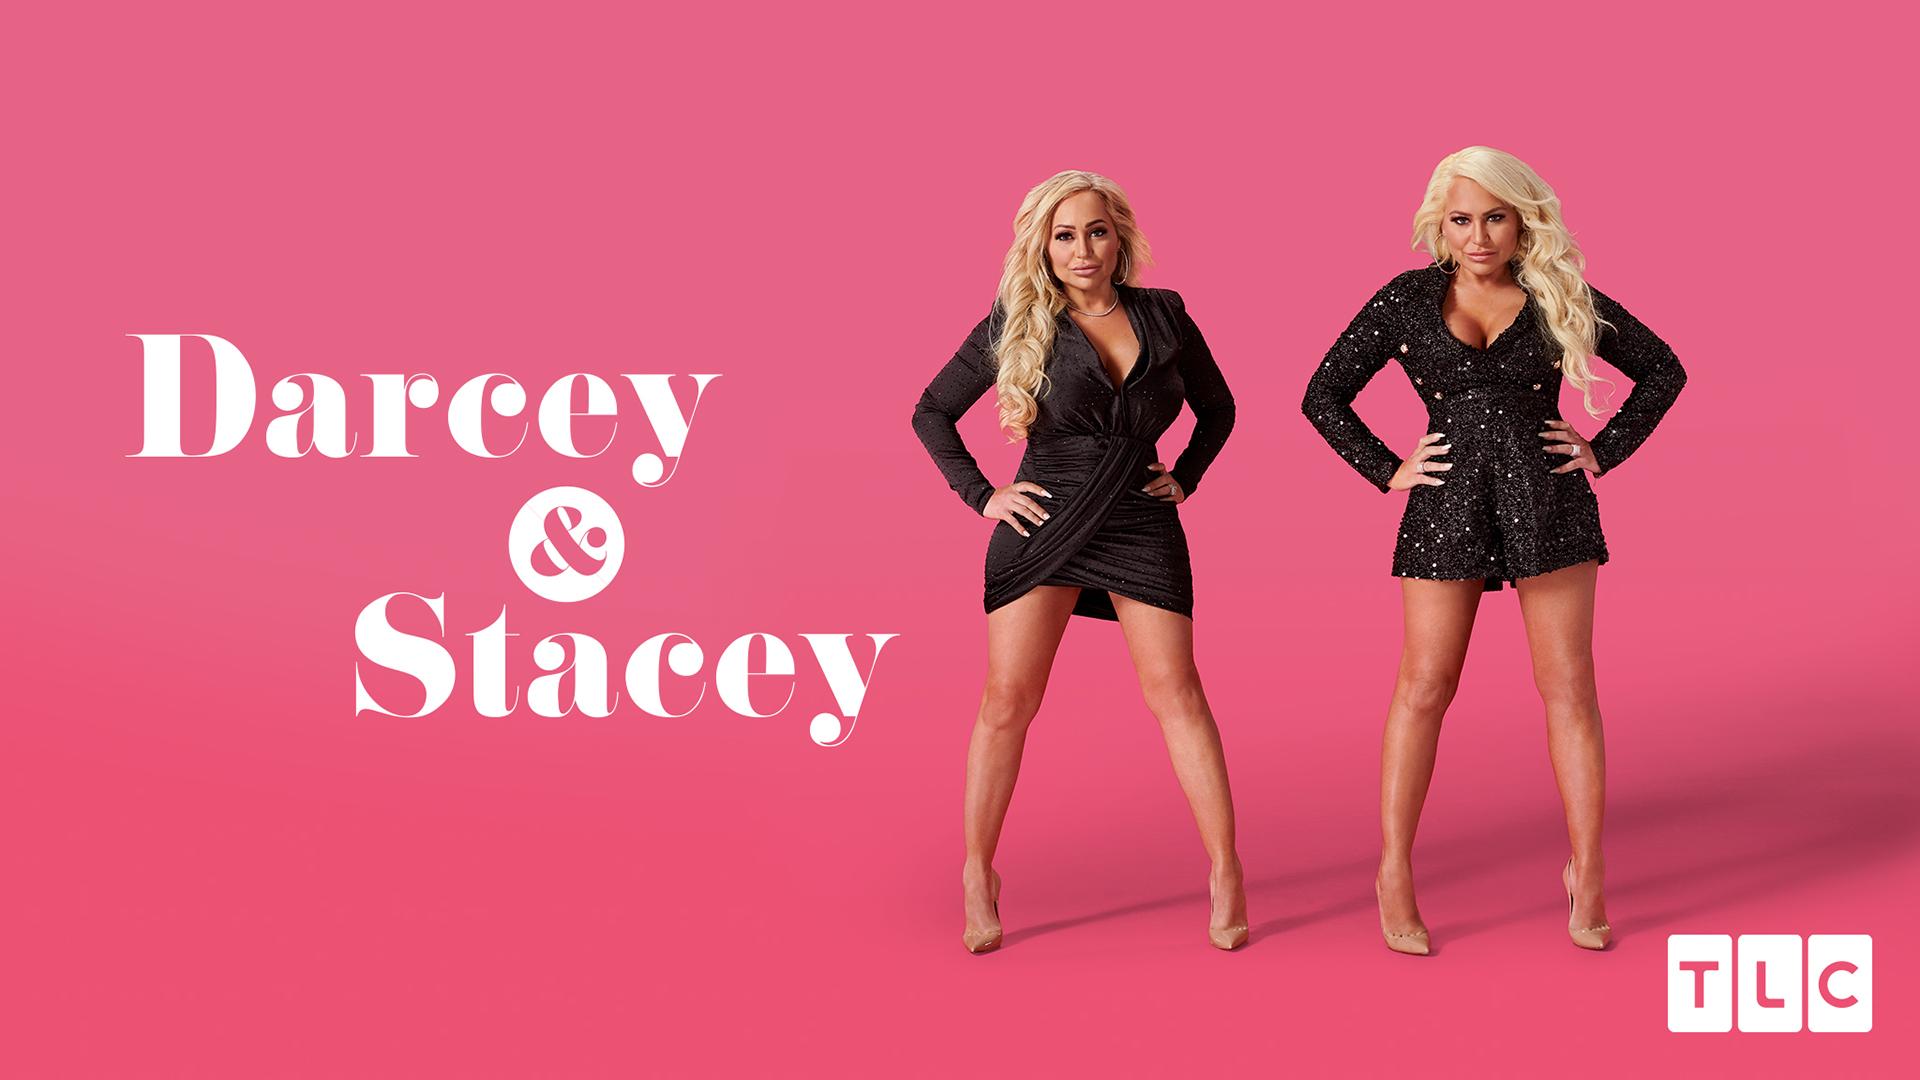 Darcey & Stacey Season 1